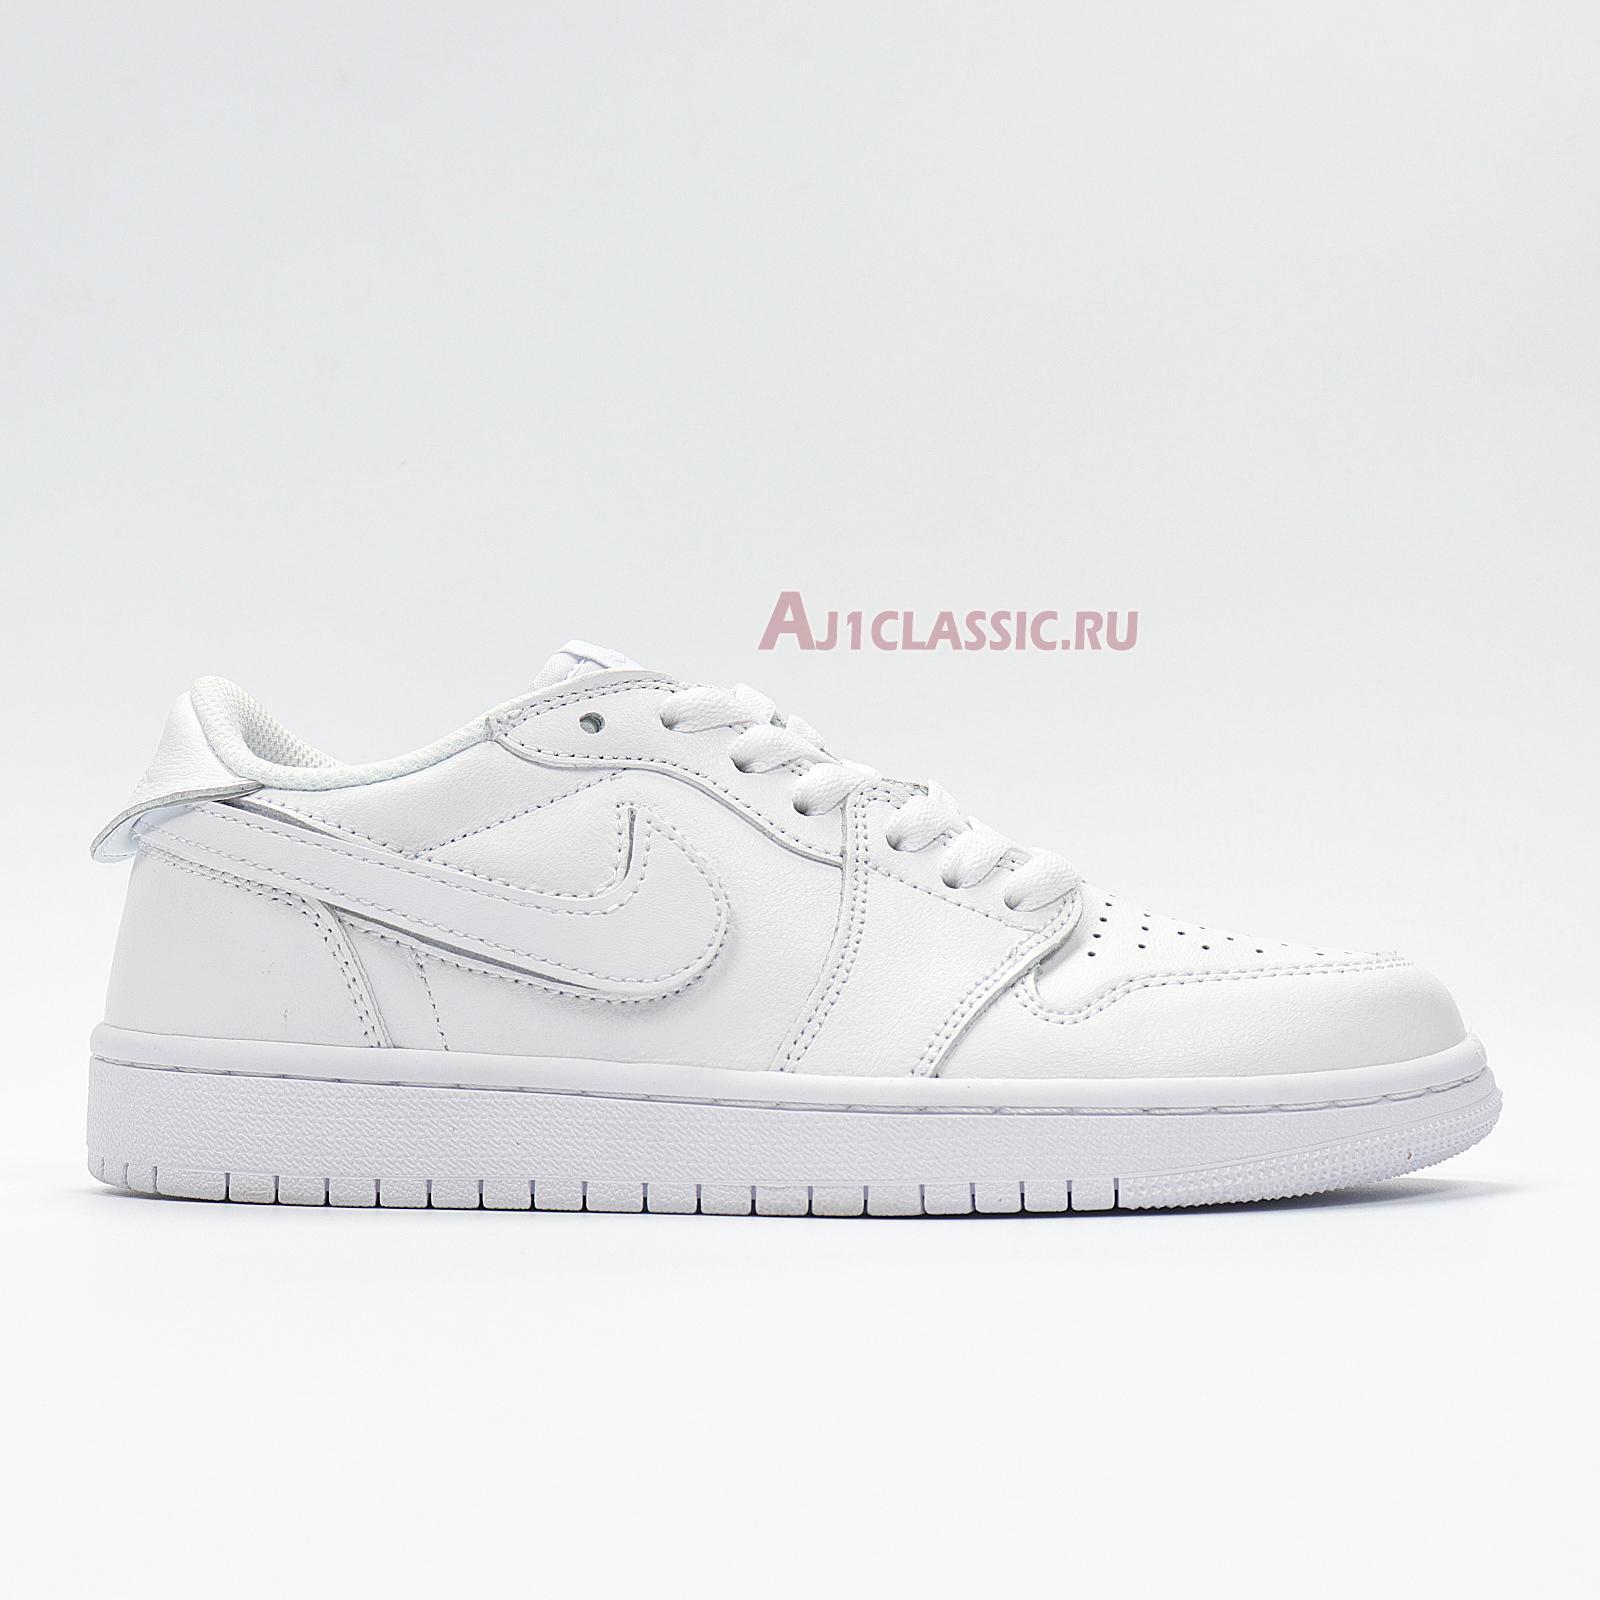 "Air Jordan 1 Low ID Velcro ""White"" CJ7891-ID"